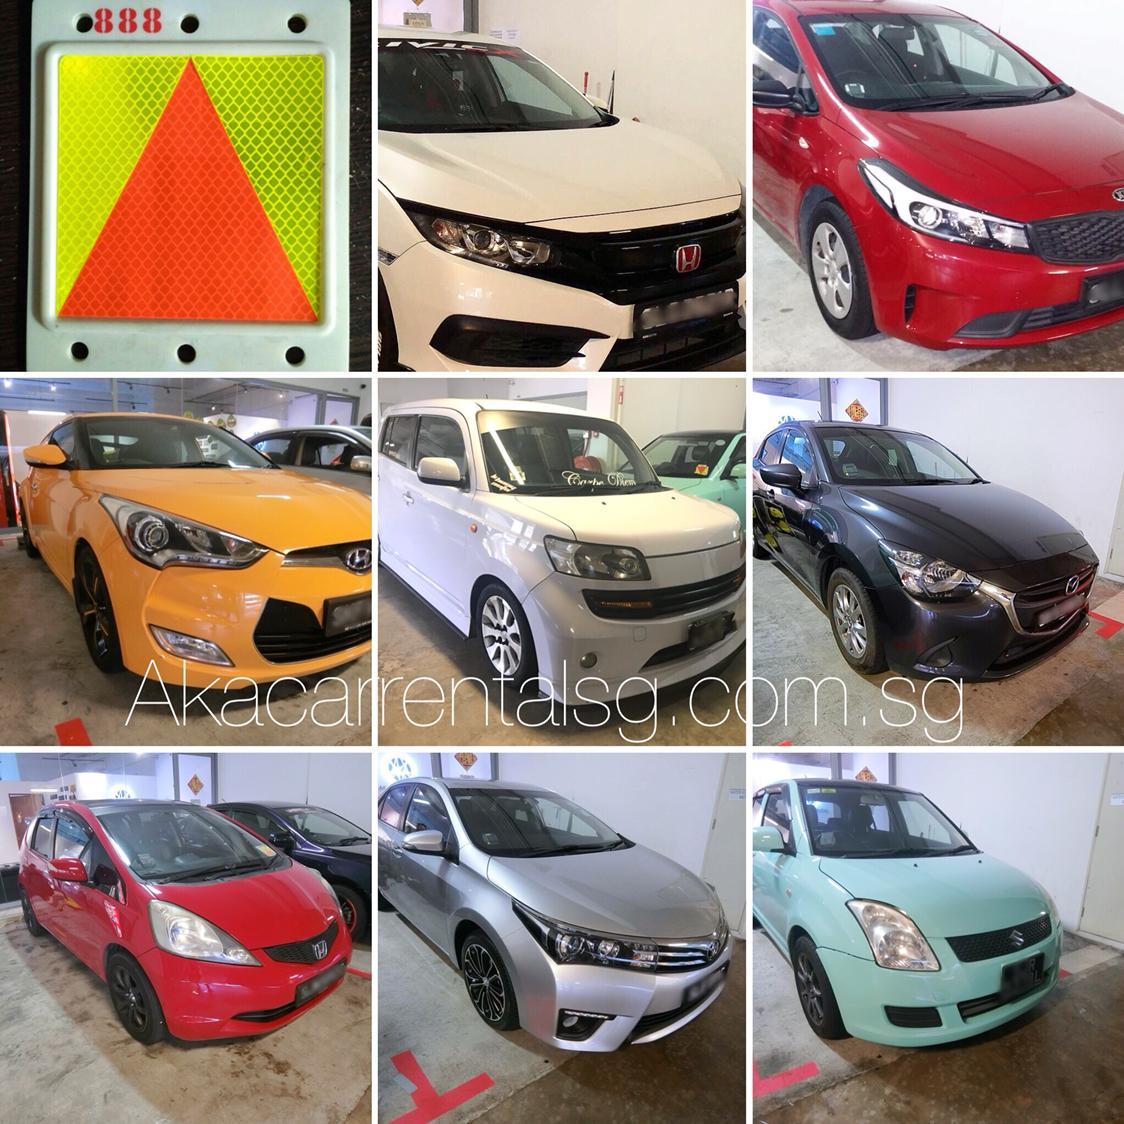 No Deposit P Plate Car Rental Cars Vehicle Rentals On